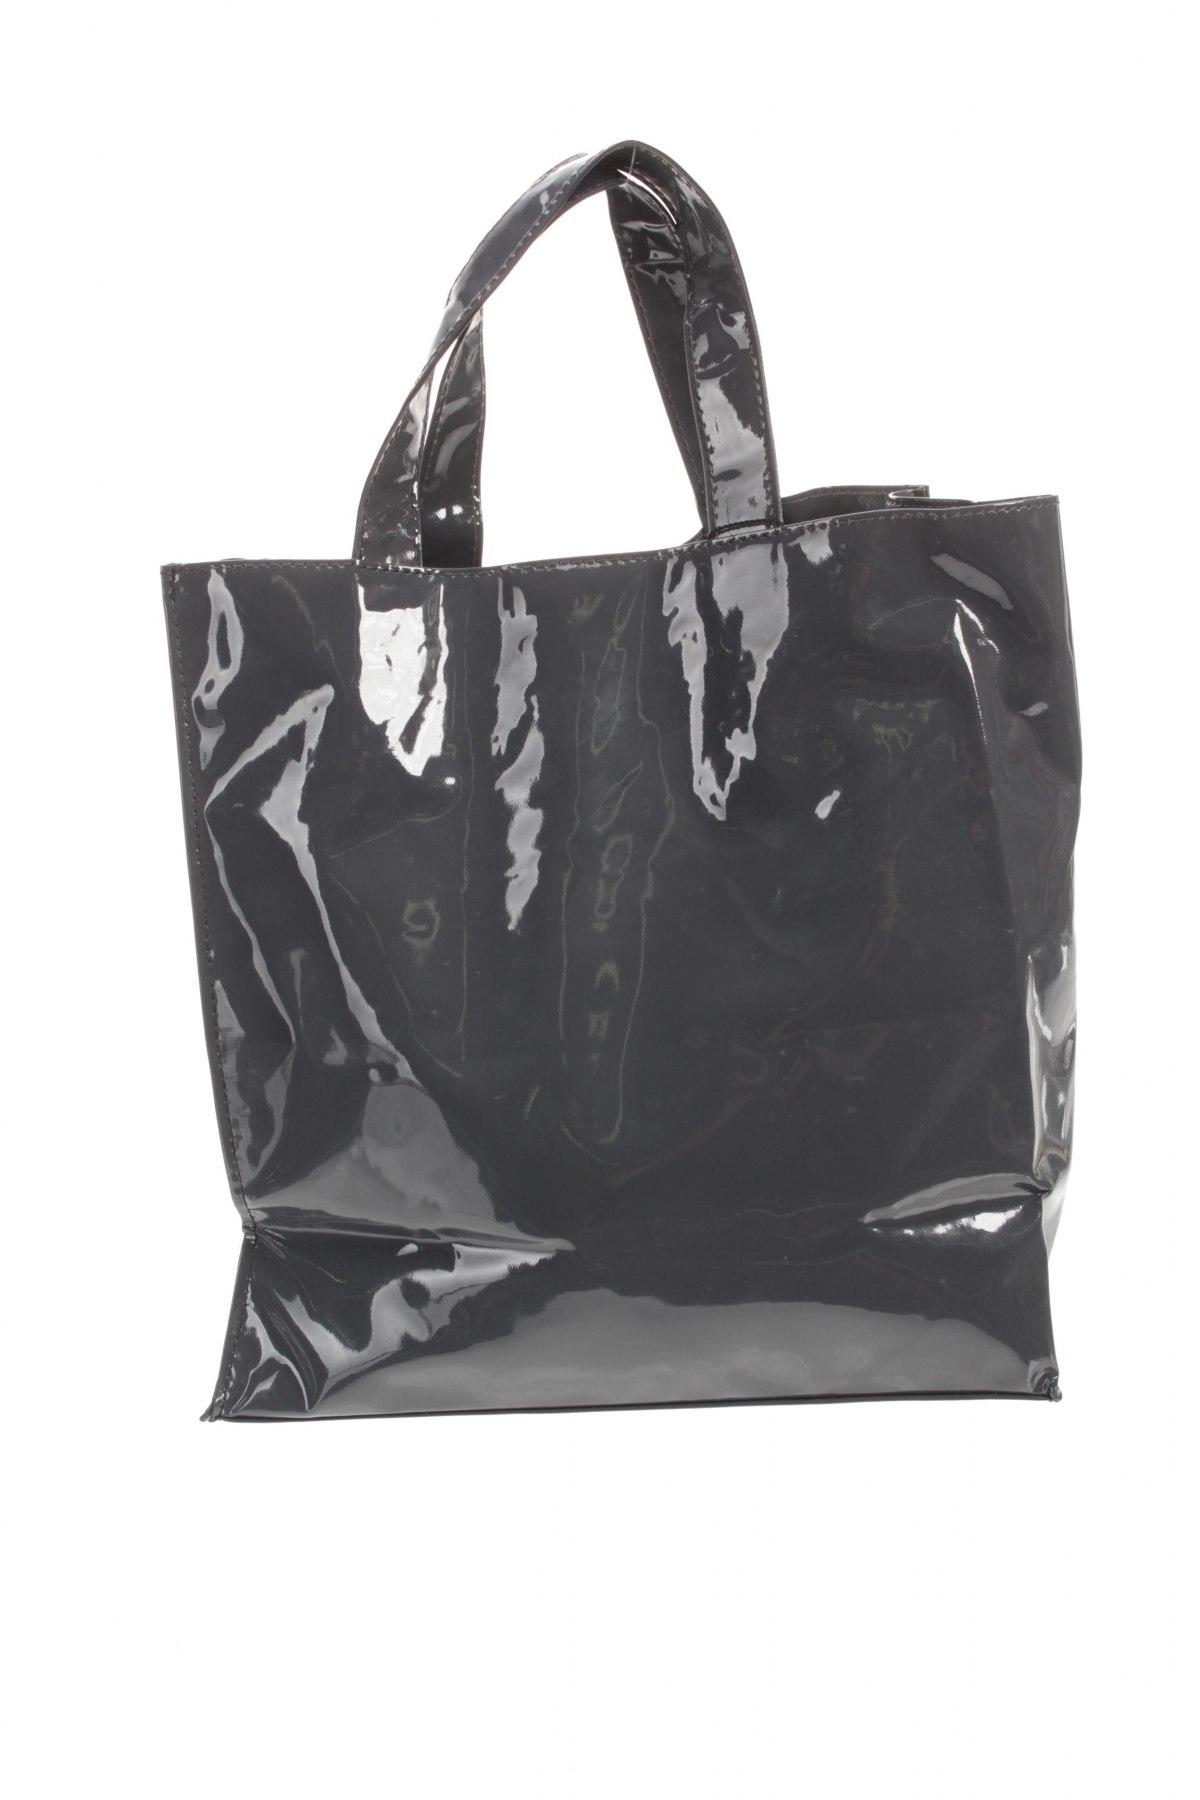 828fc23520 Γυναικεία τσάντα Piazza Italia - σε συμφέρουσα τιμή στο Remix -  7528713